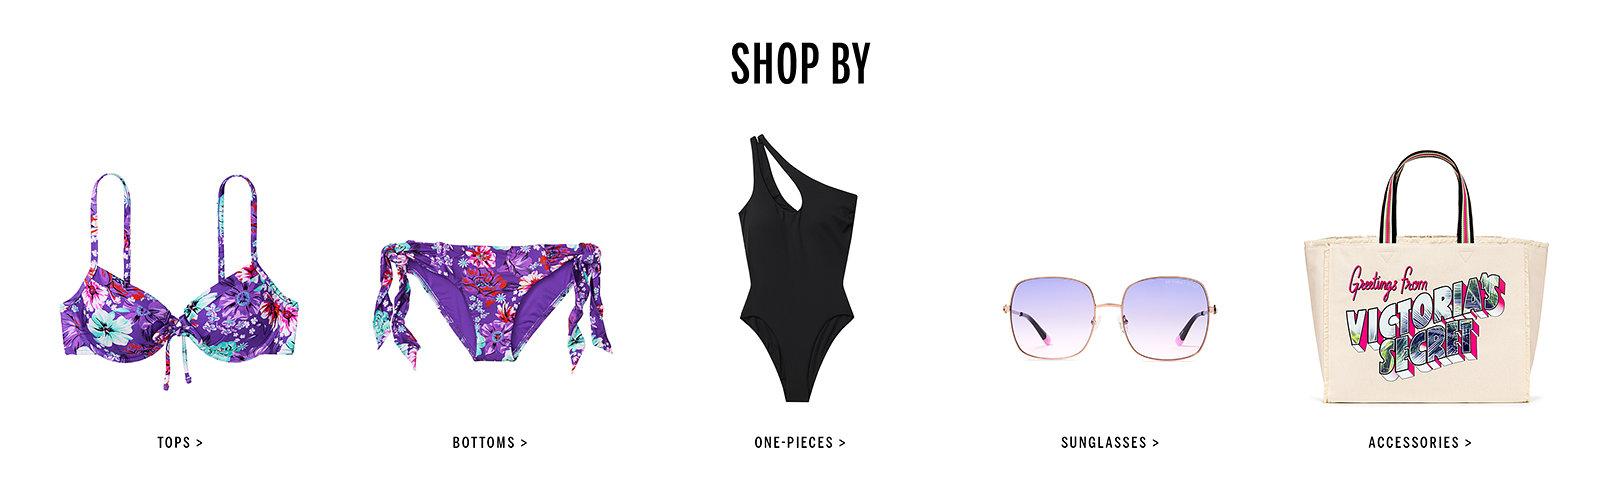 fdf387b6633 Women's Swimwear Styles - Victoria's Secret Swim